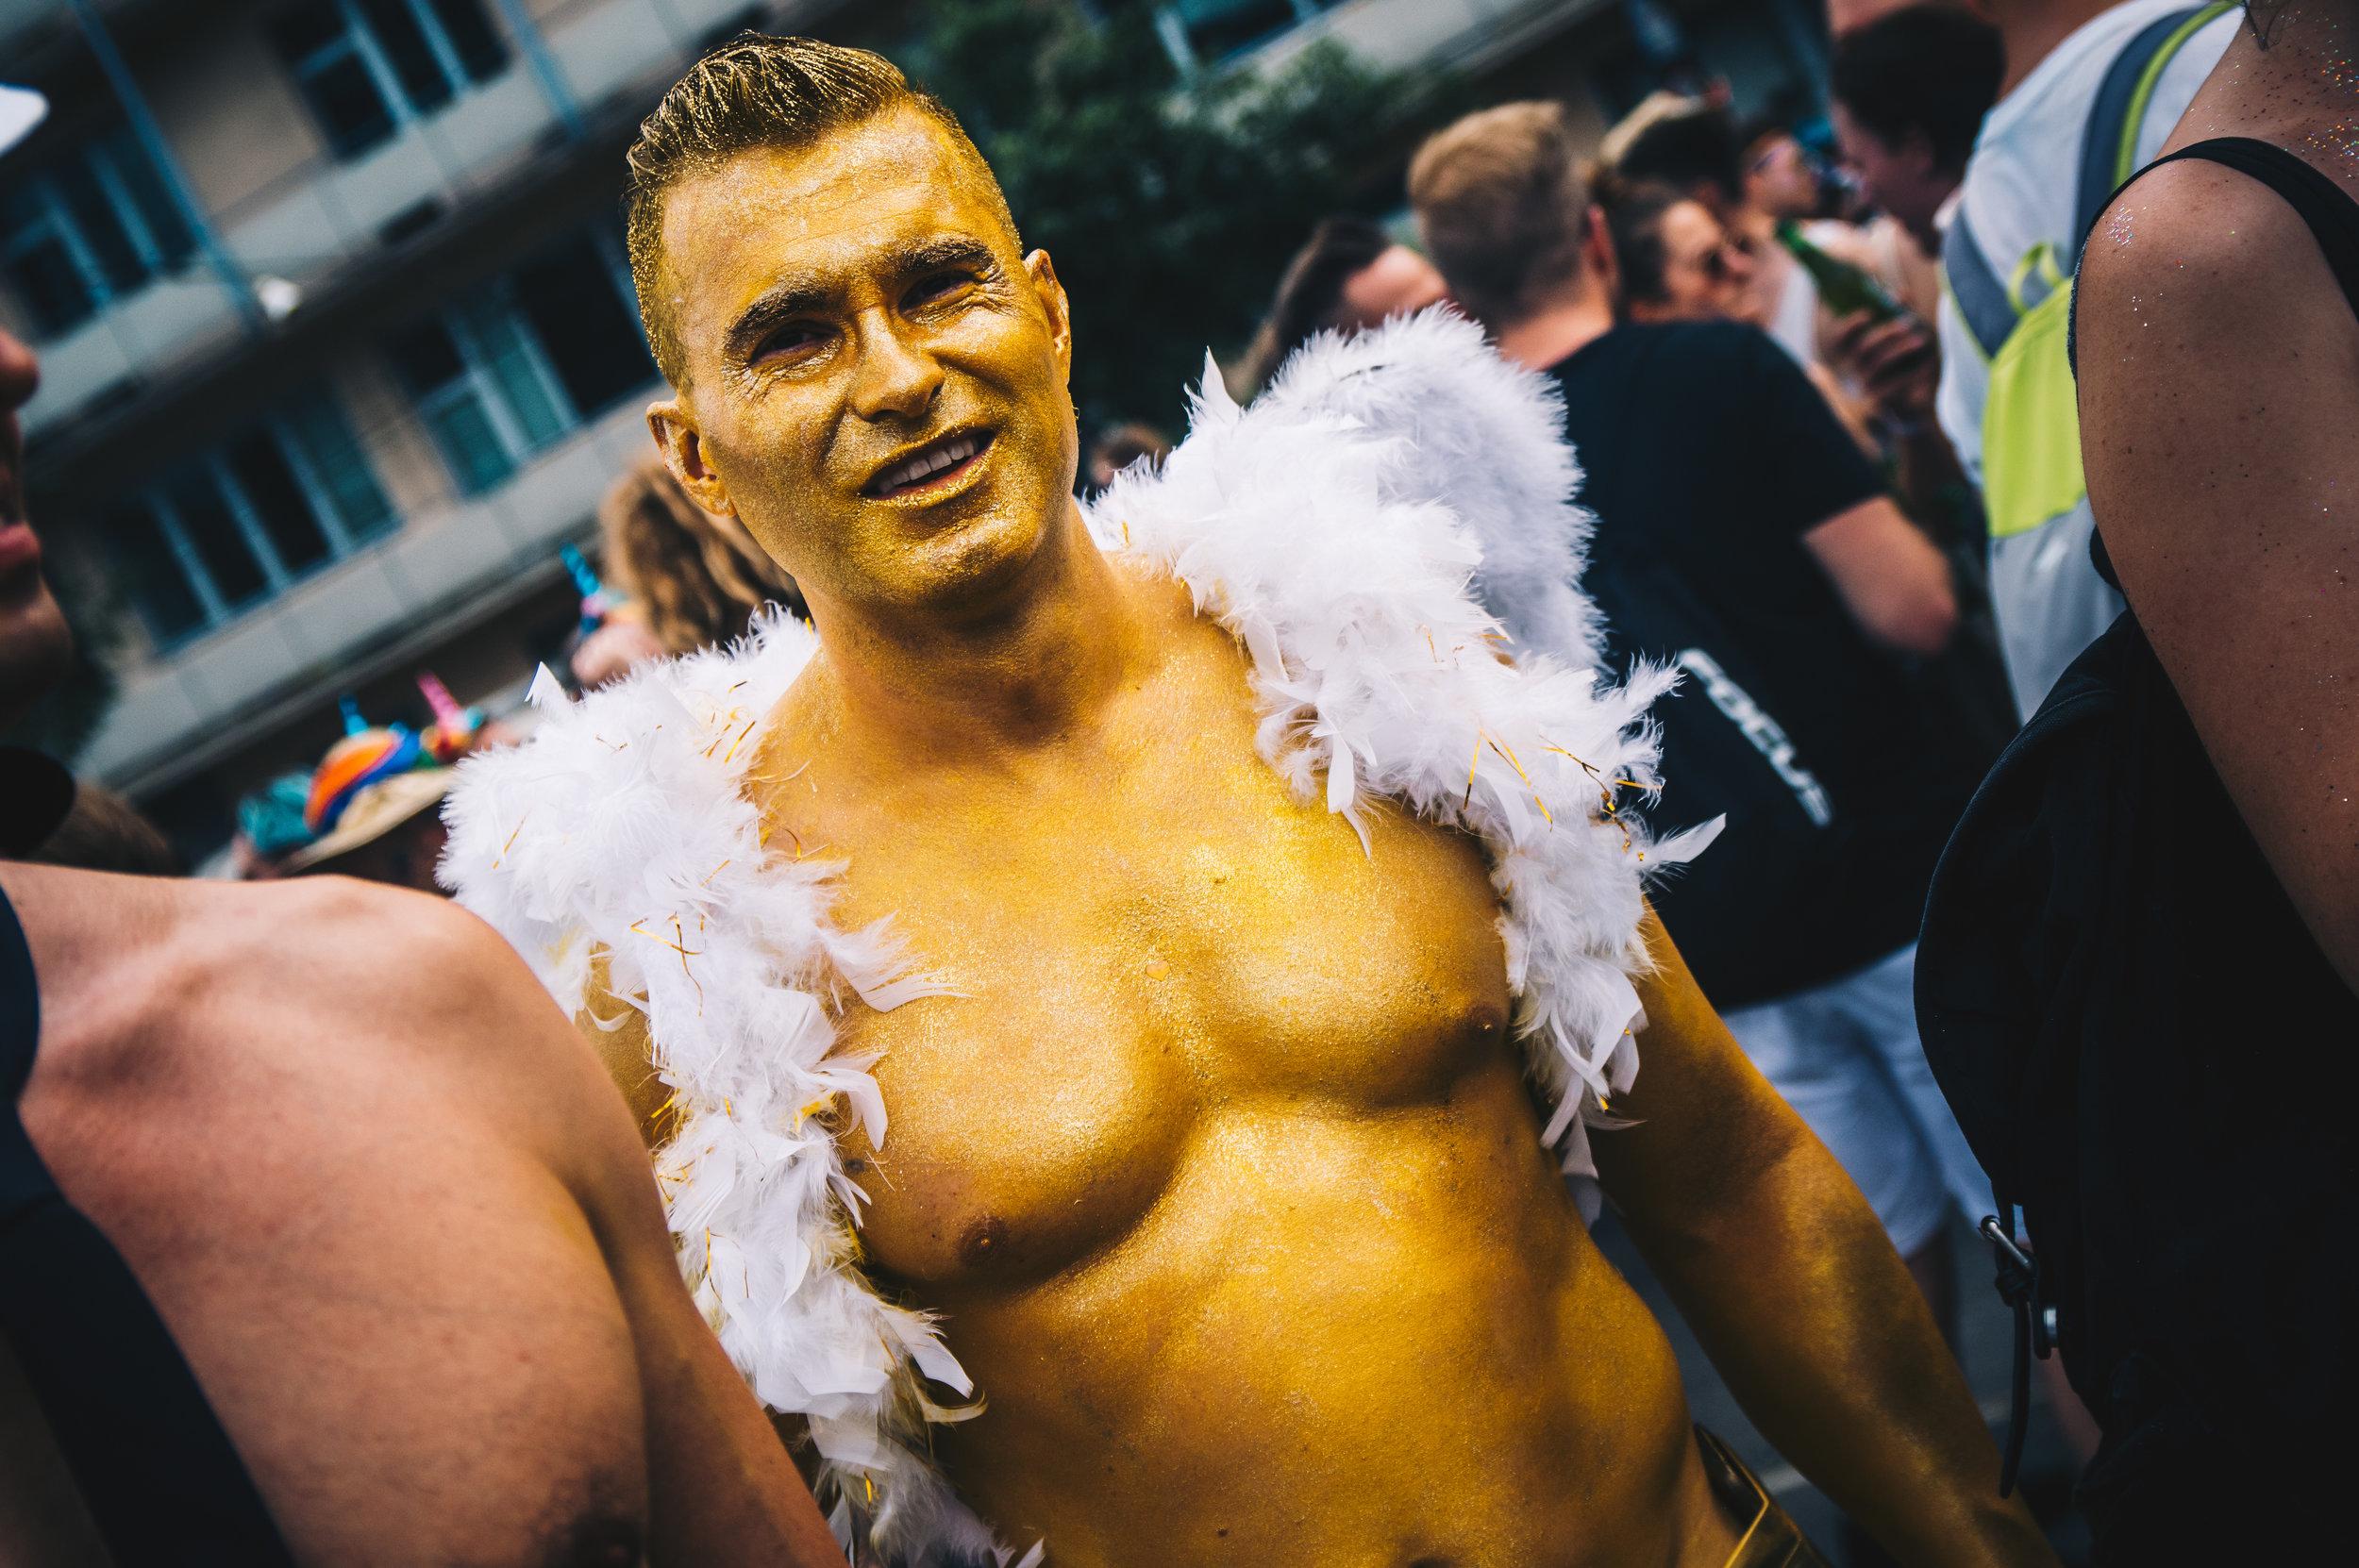 Euro Pride Vienna-5342.jpg